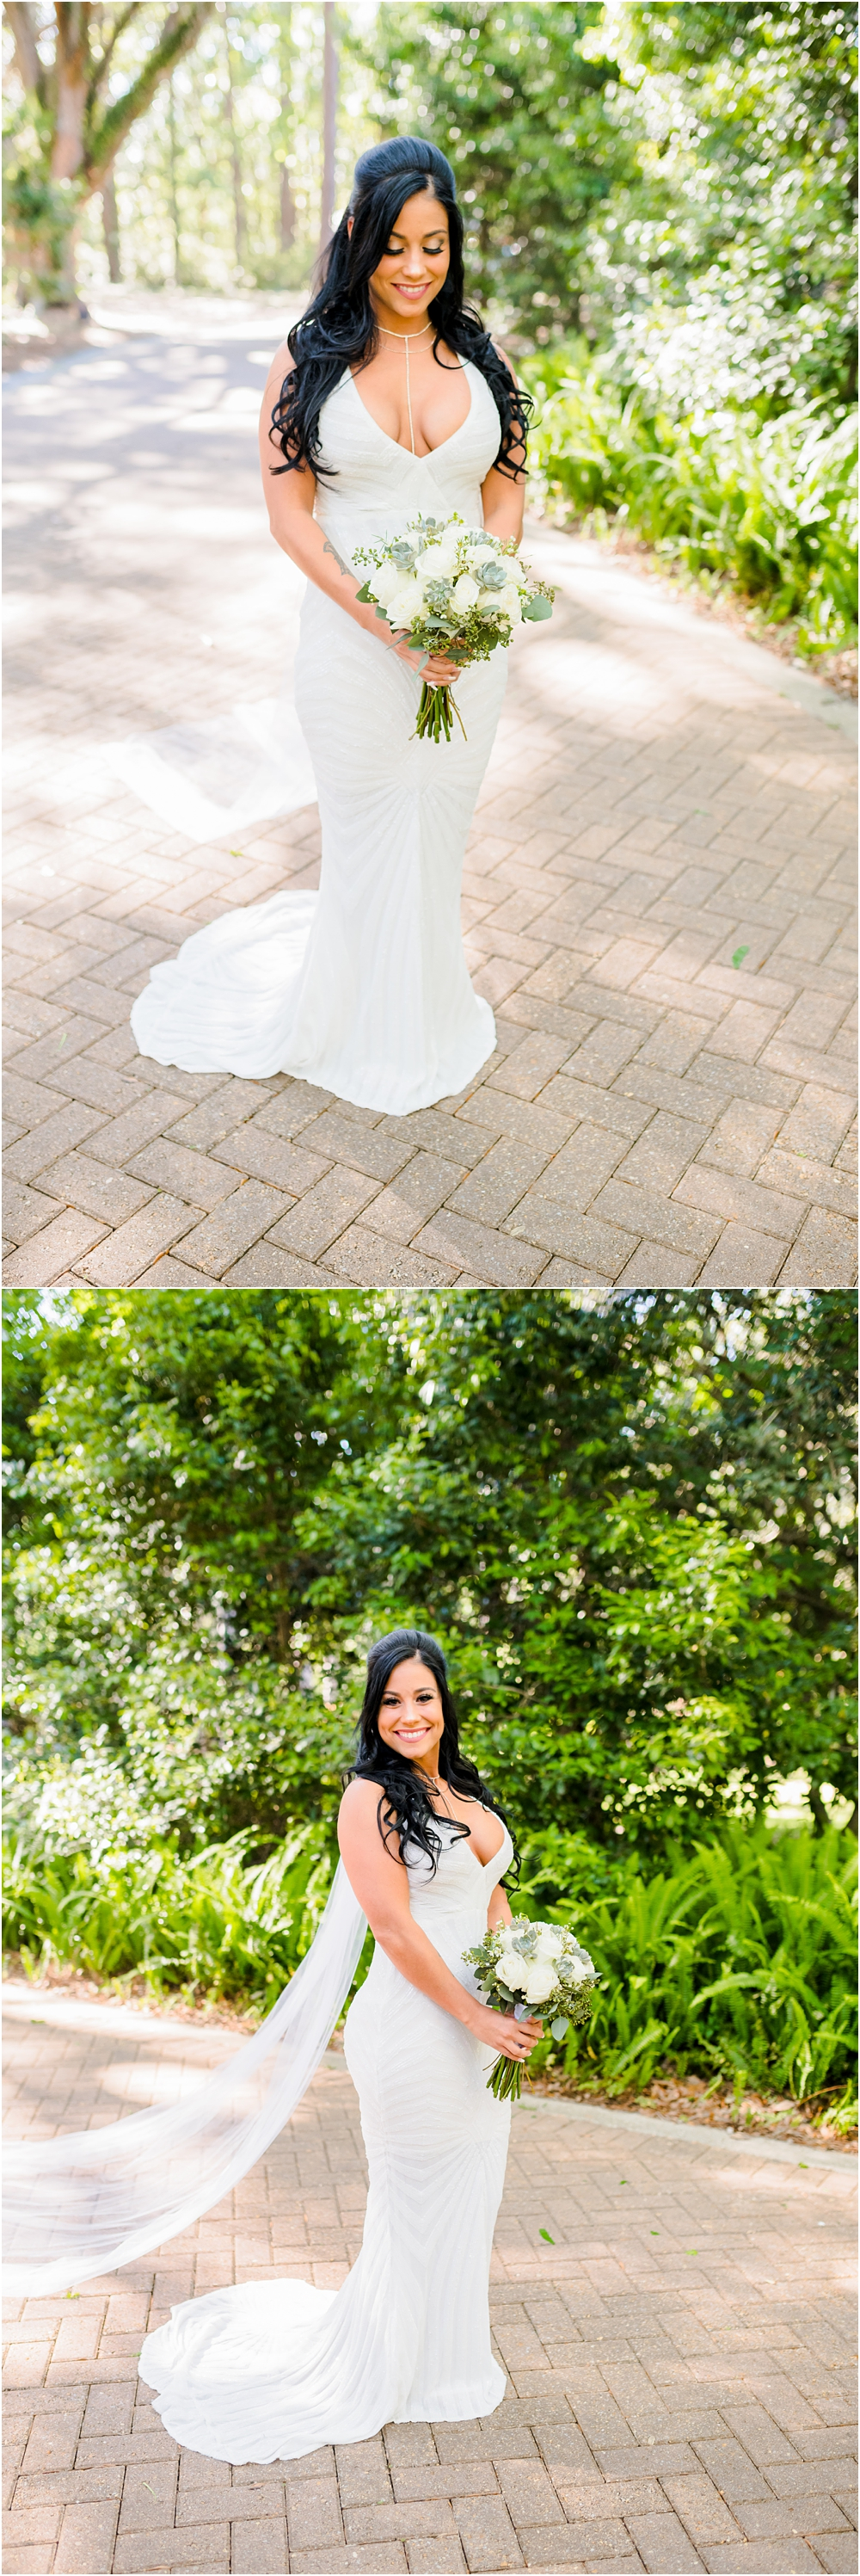 green-eden-gardens-florida-wedding-kiersten-stevenson-photography40.jpg